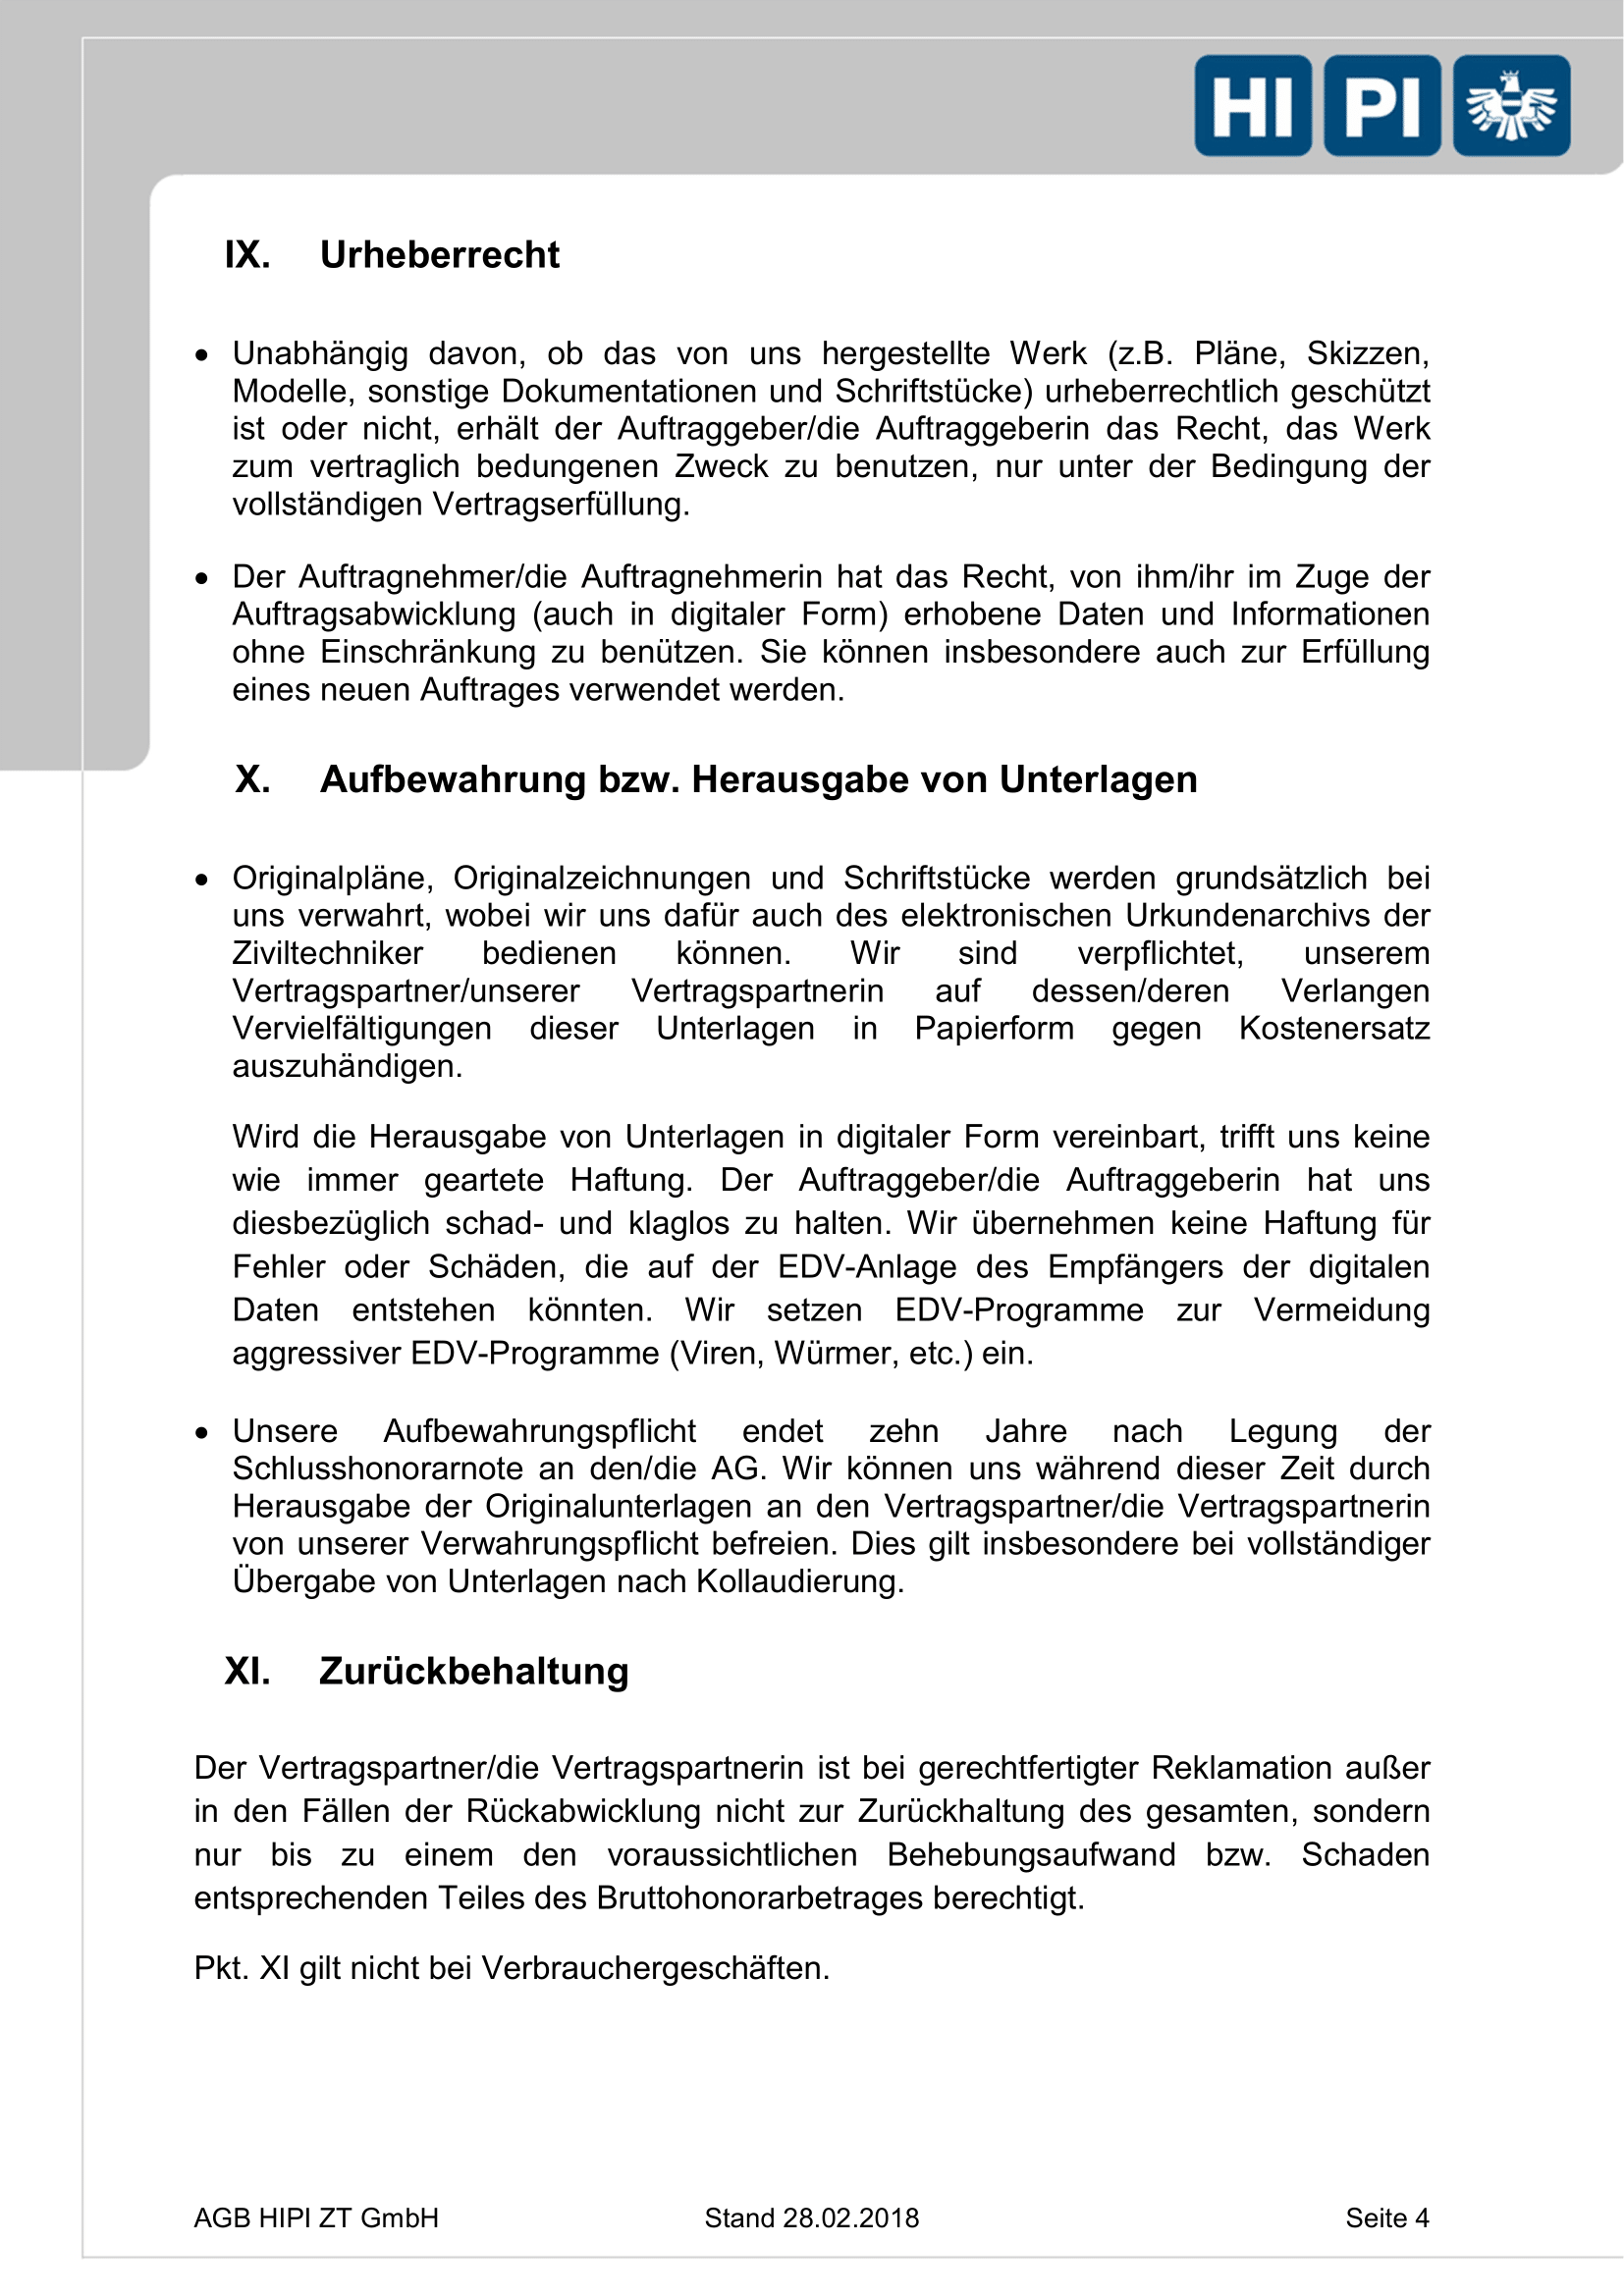 HIPI ZT GmbH AGB Seite 4